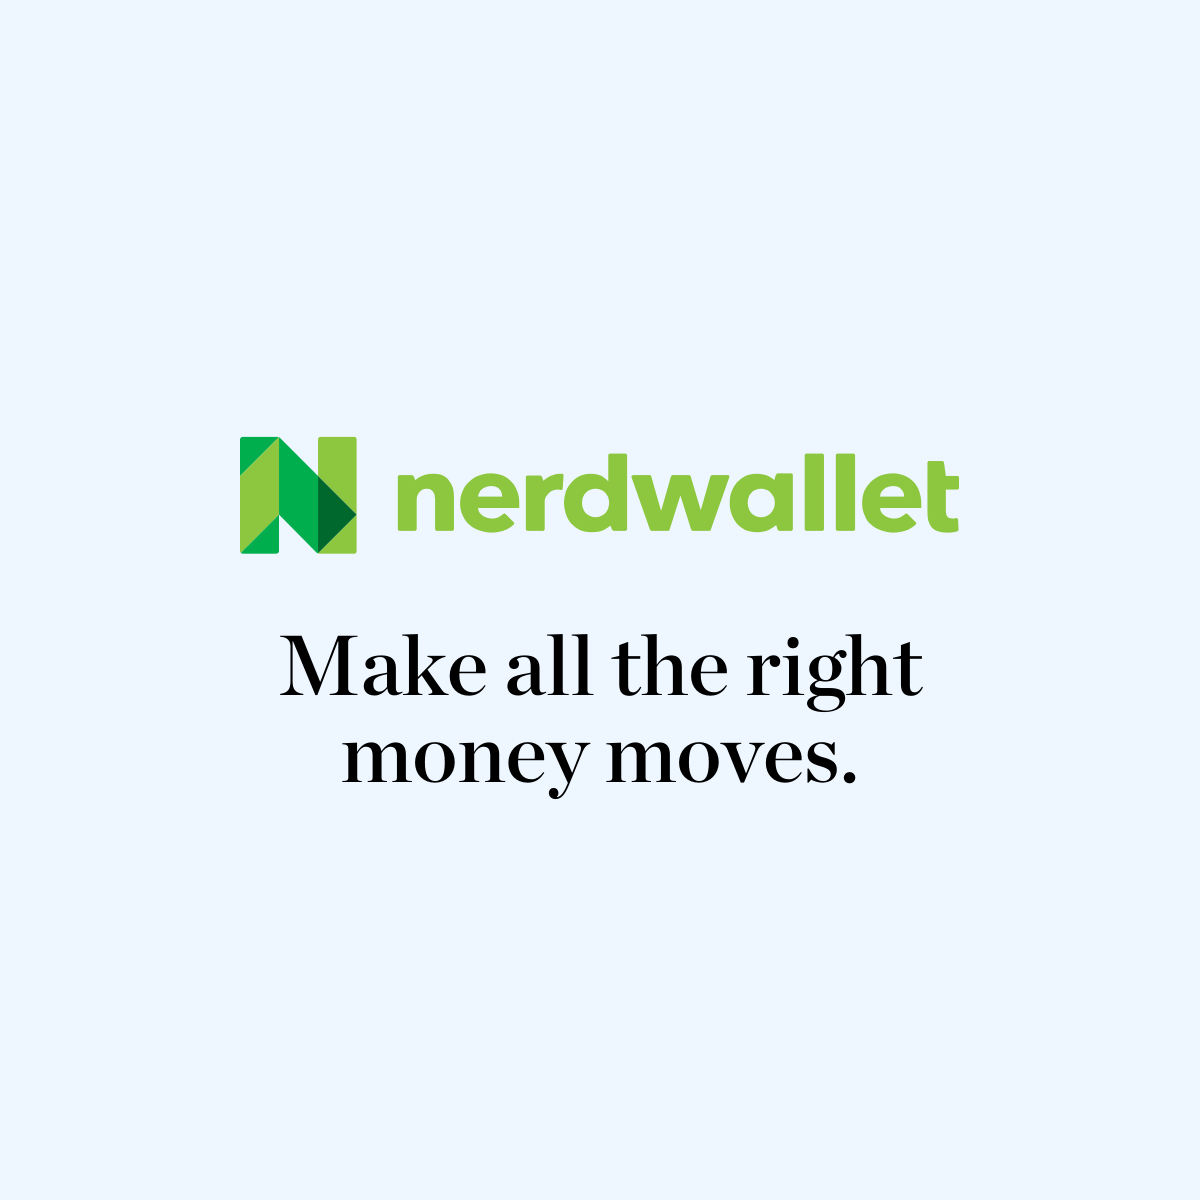 NerdWallet: Make all the right money moves